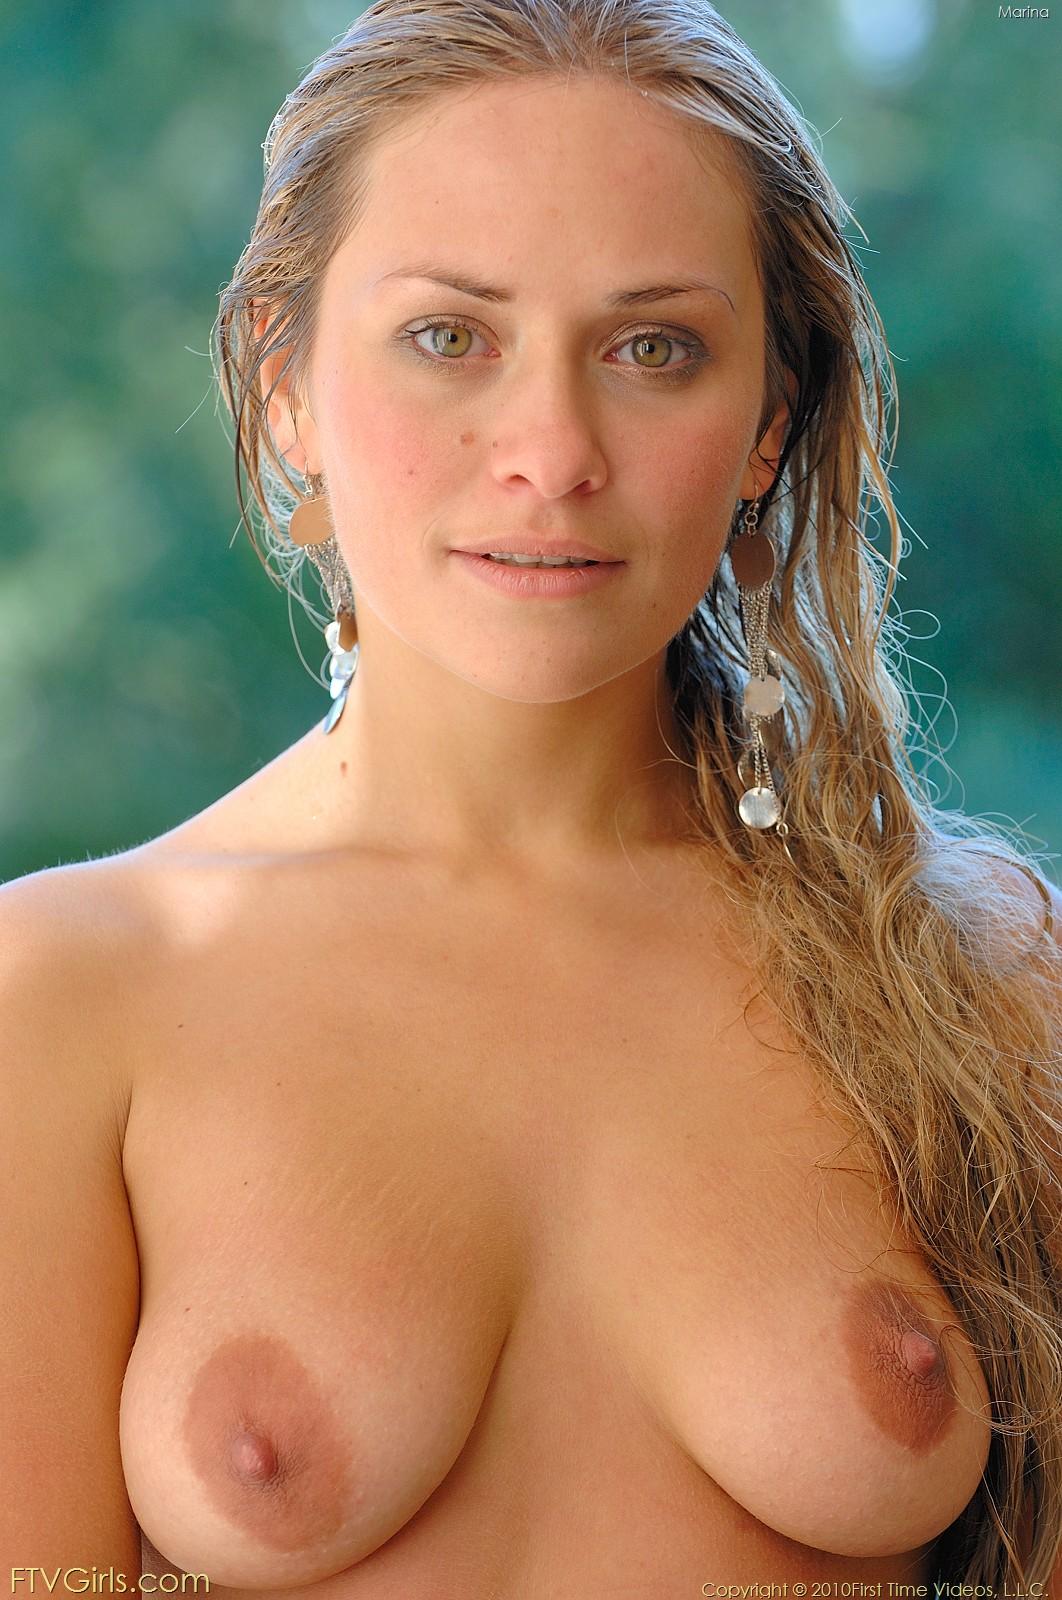 wpid-marina-shows-off-her-sweet-tits2.jpg